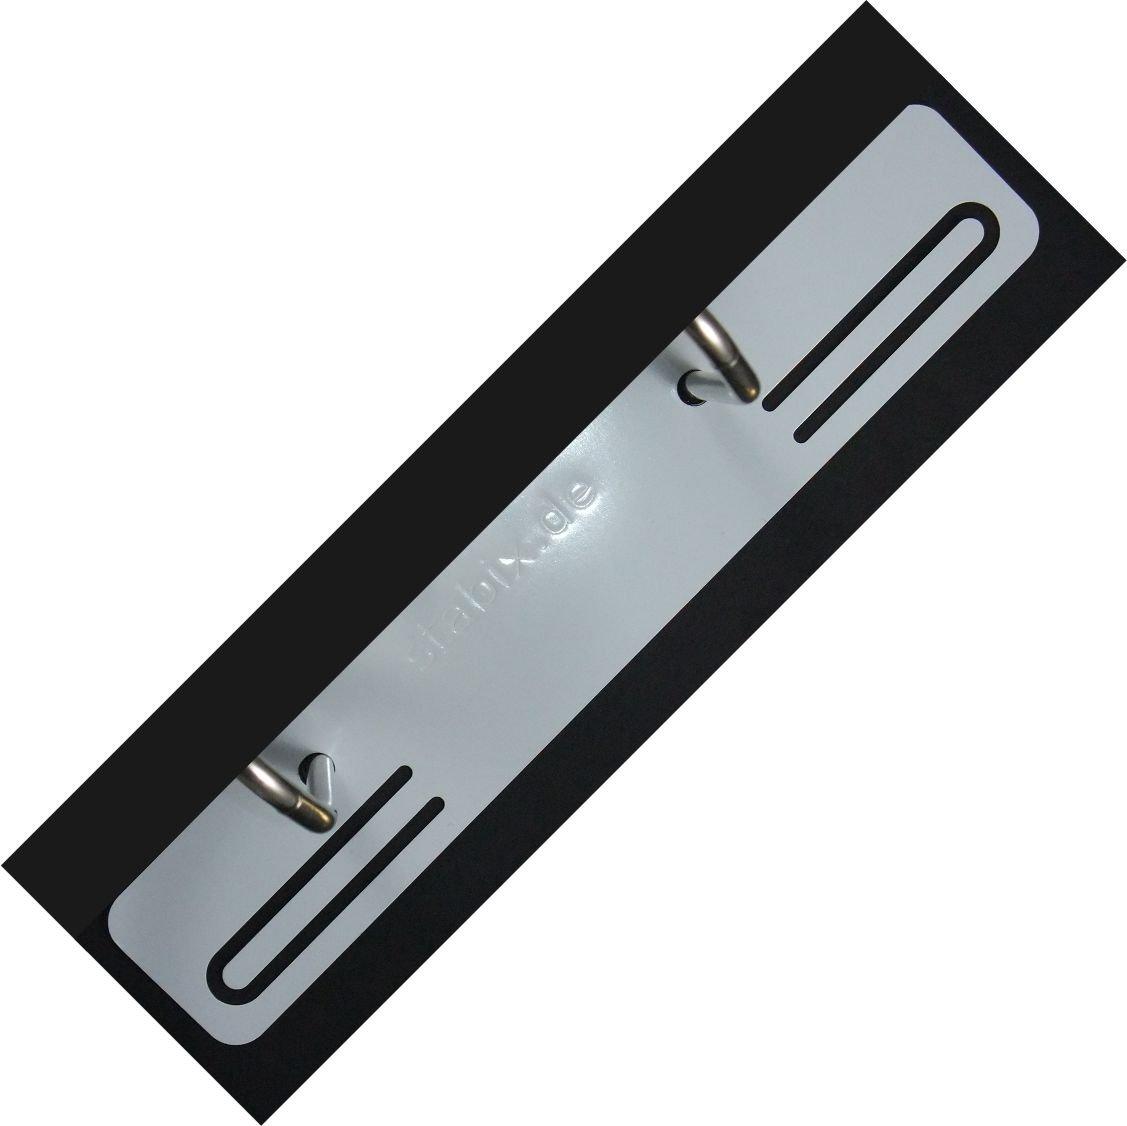 Heftstreifen  10 stabix - der Heftstreifen aus Metall bzw. Stahlblech - in weiß ...